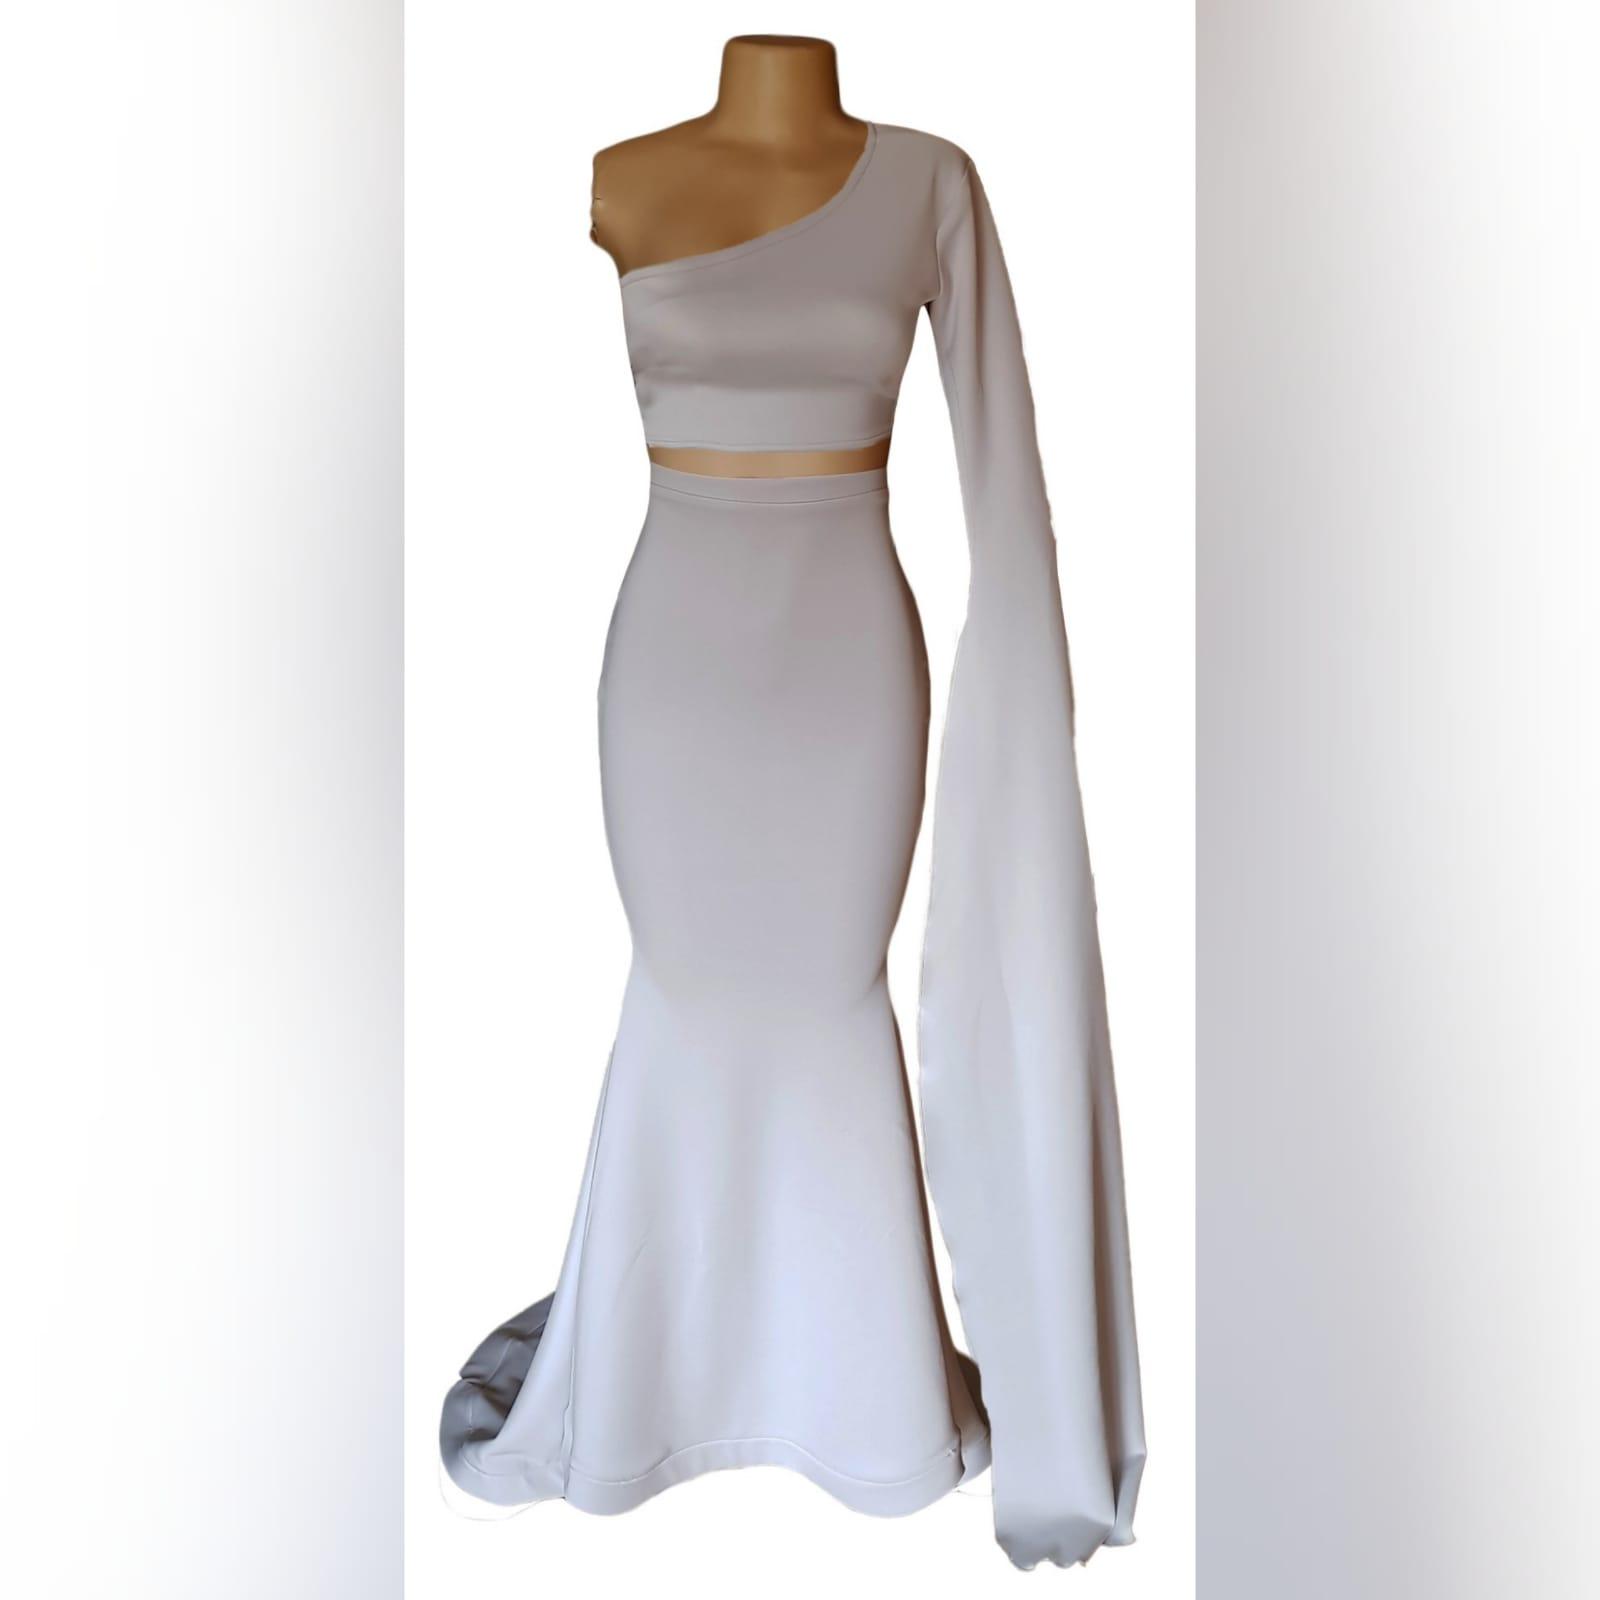 Pale grey 2 piece mermaid prom dress 4 pale grey 2 piece mermaid prom dress. Fitted crop top with wide single sleeve creating a train. Mermaid skirt with a little train.